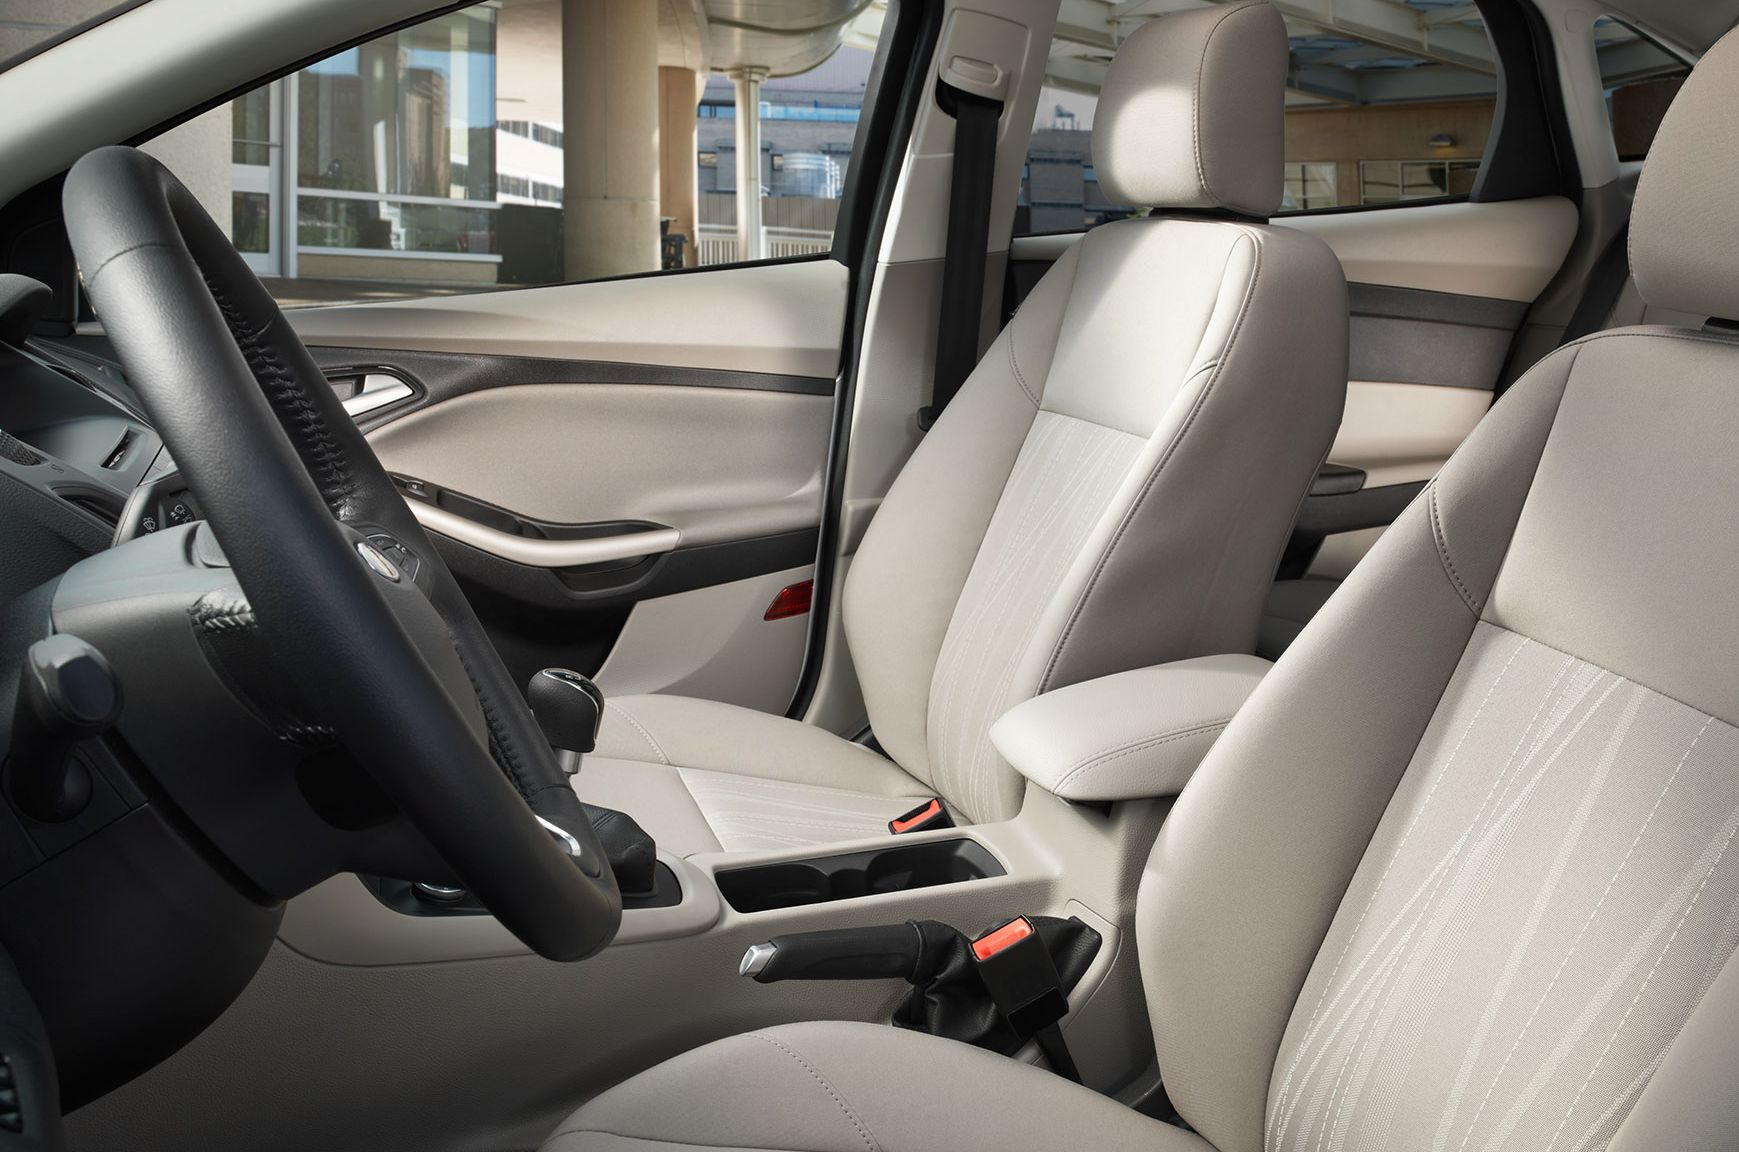 2017 Ford Focus for Sale near Dallas TX Prestige Ford